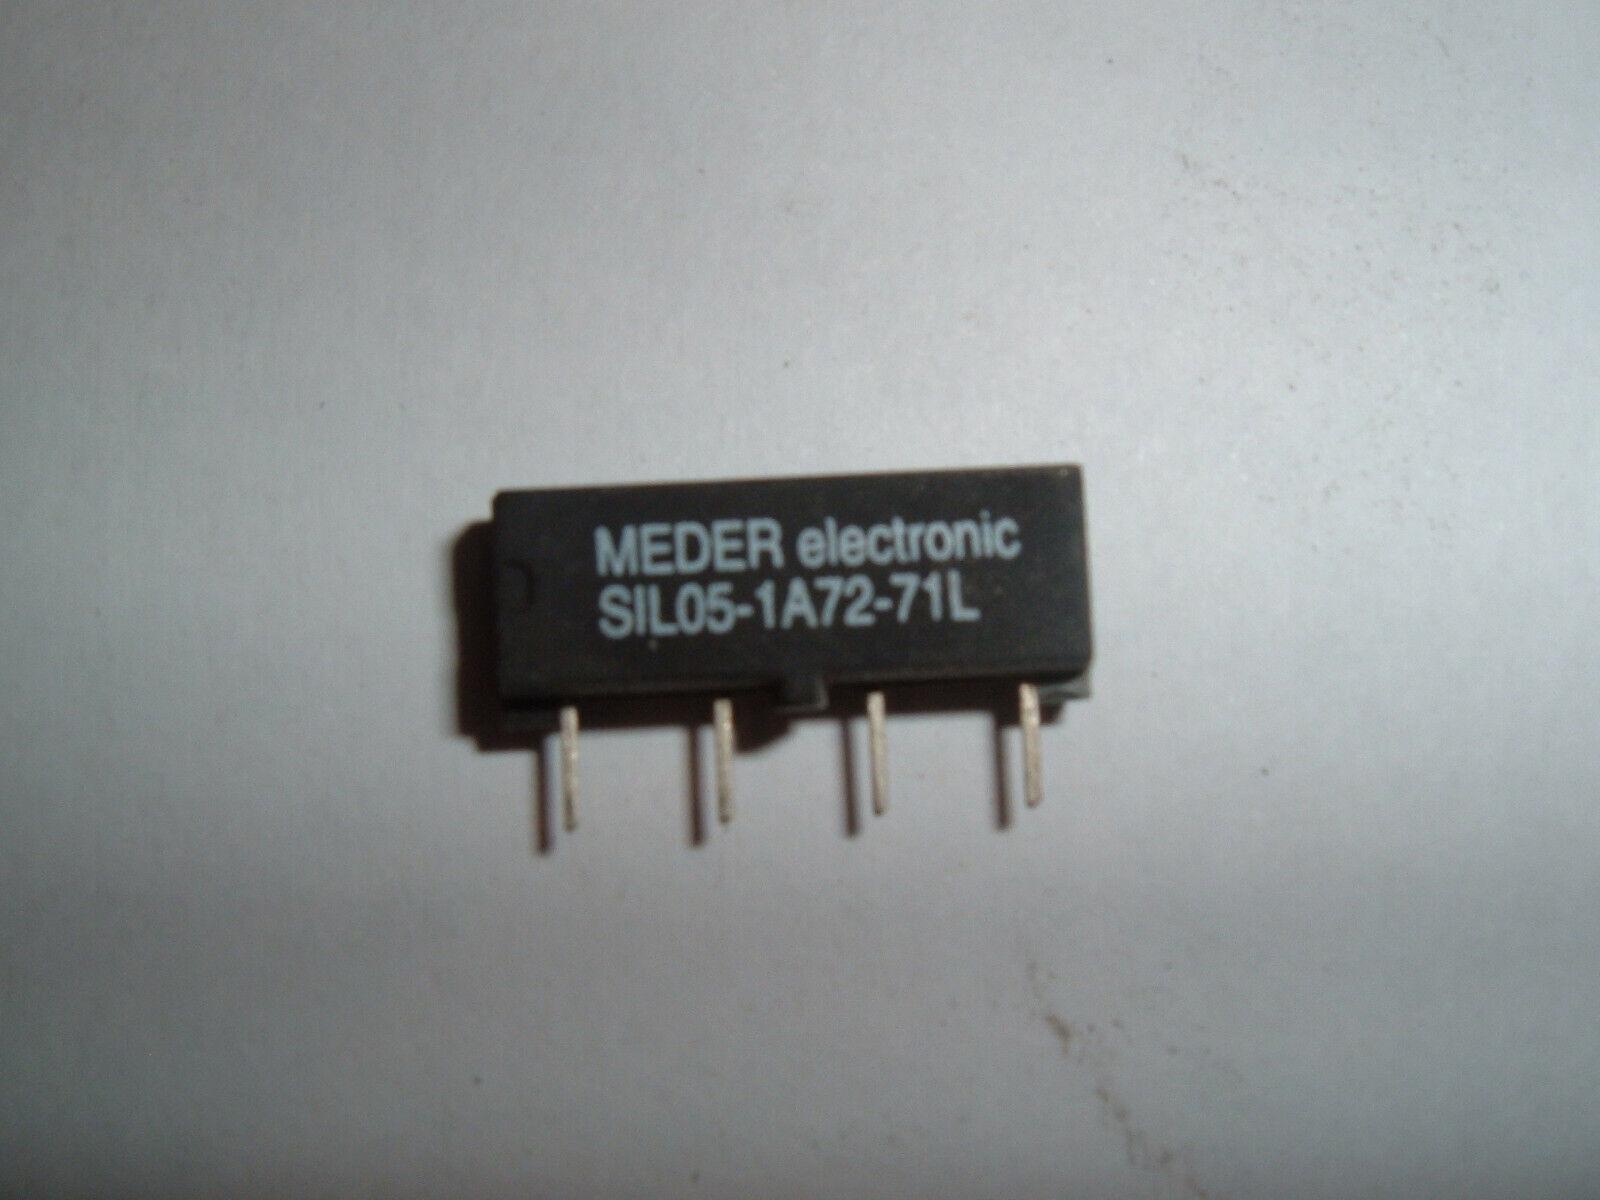 Meder Reed Relais SIL05-1A72-71L,5V,1x EIN,500 Ohm,ohne Diode